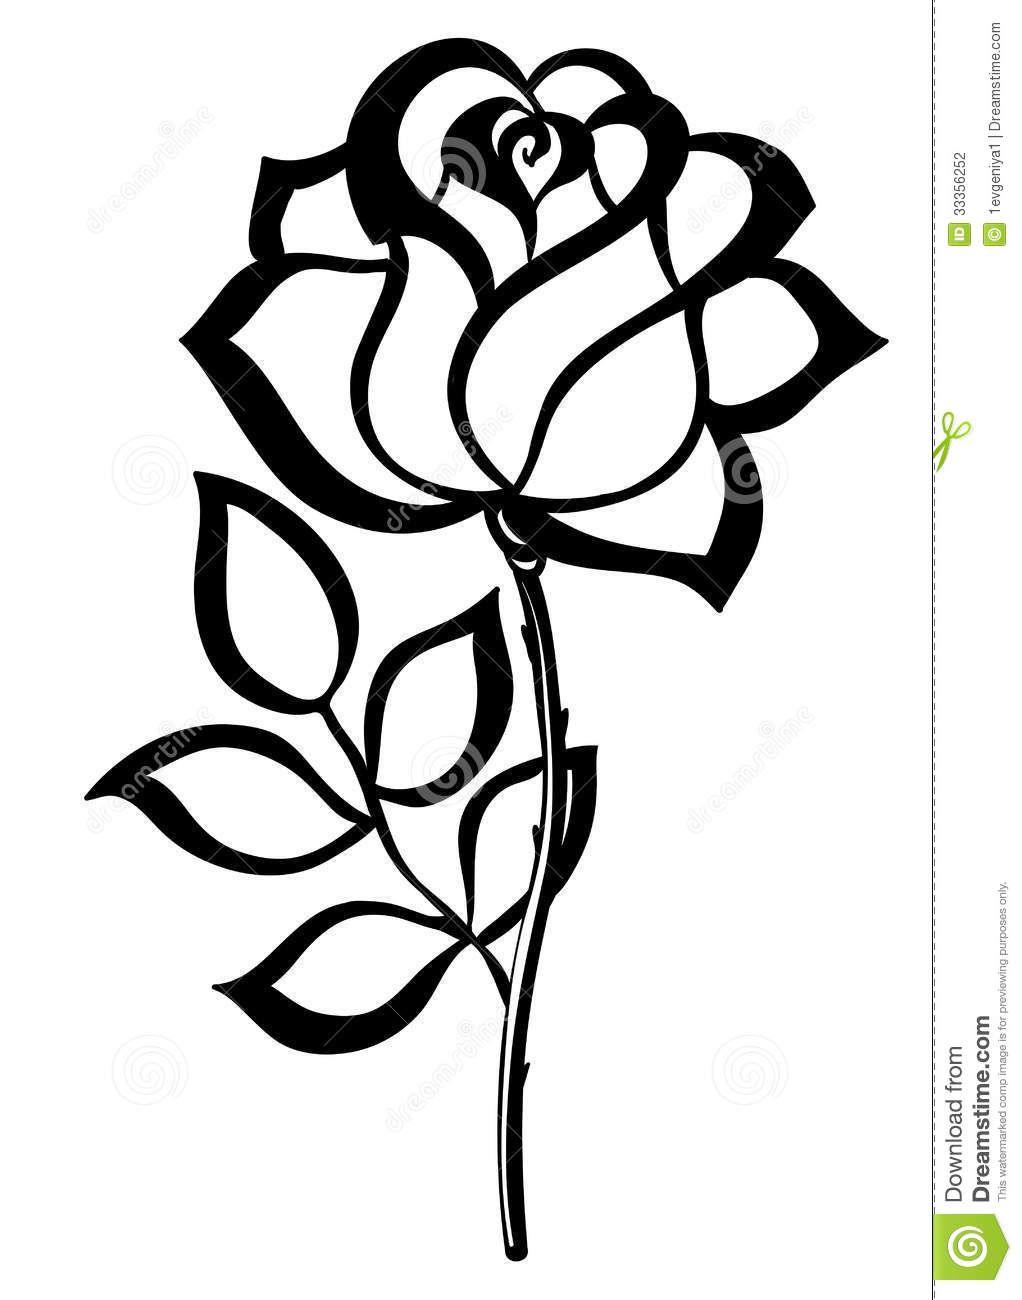 1022x1300 Simple Rose Outline Simple Single Rose Outline Black Silhouette